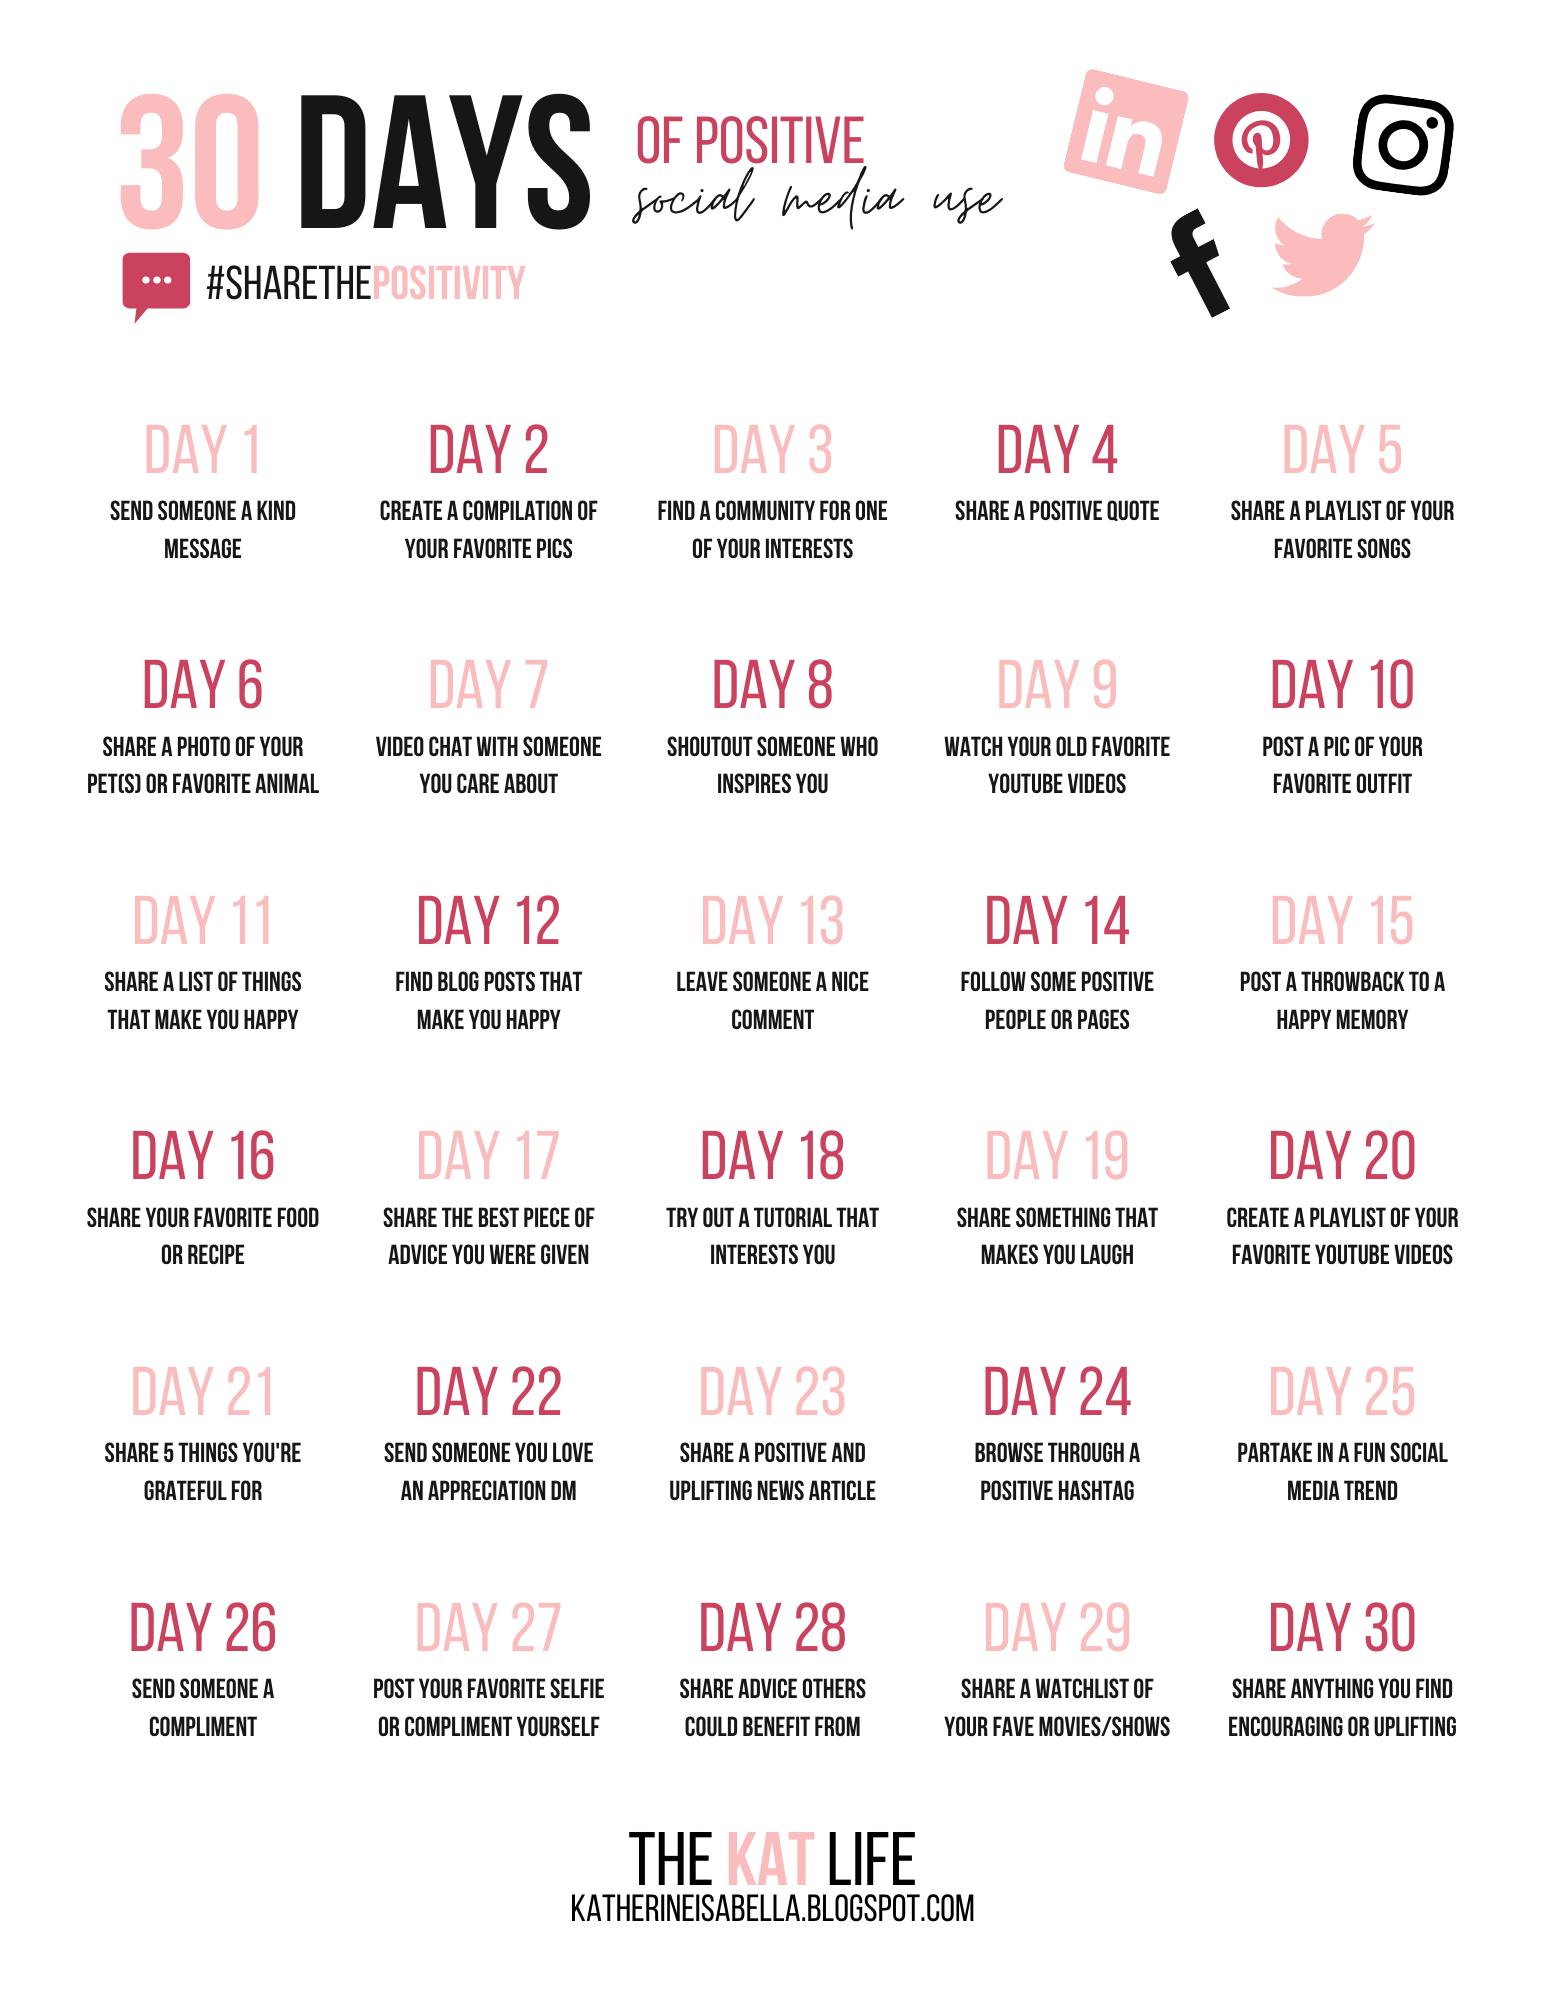 30 Days Of Positive Social Media Use Positivity Challenge Social Media Challenges Social Media Quotes